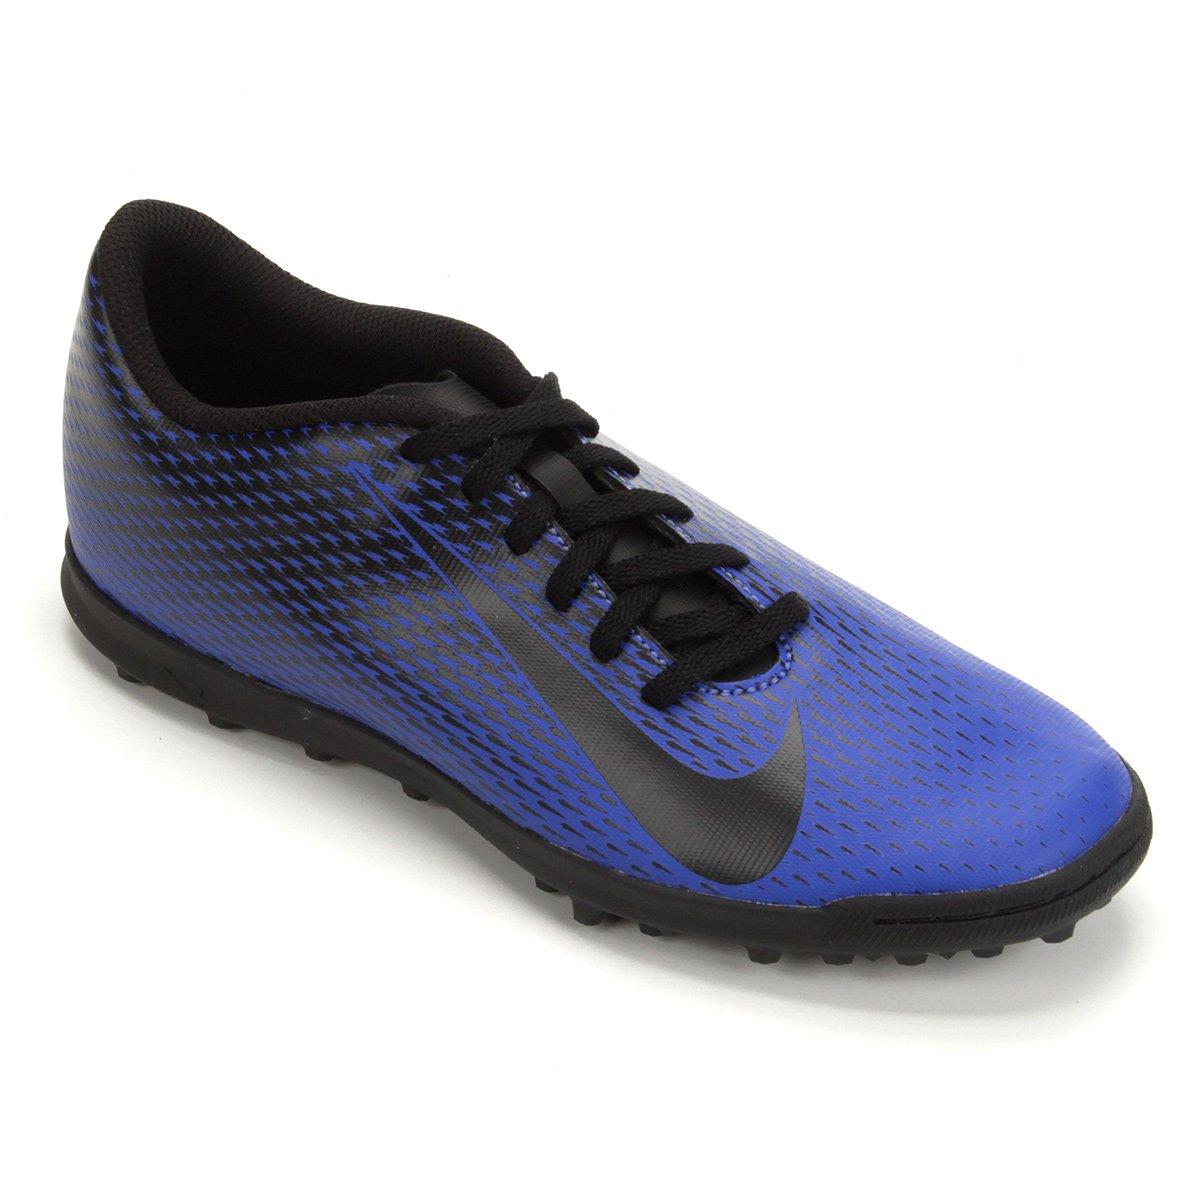 cb29748a44 Chuteira Society Nike Bravata 2 TF - Azul e Preto